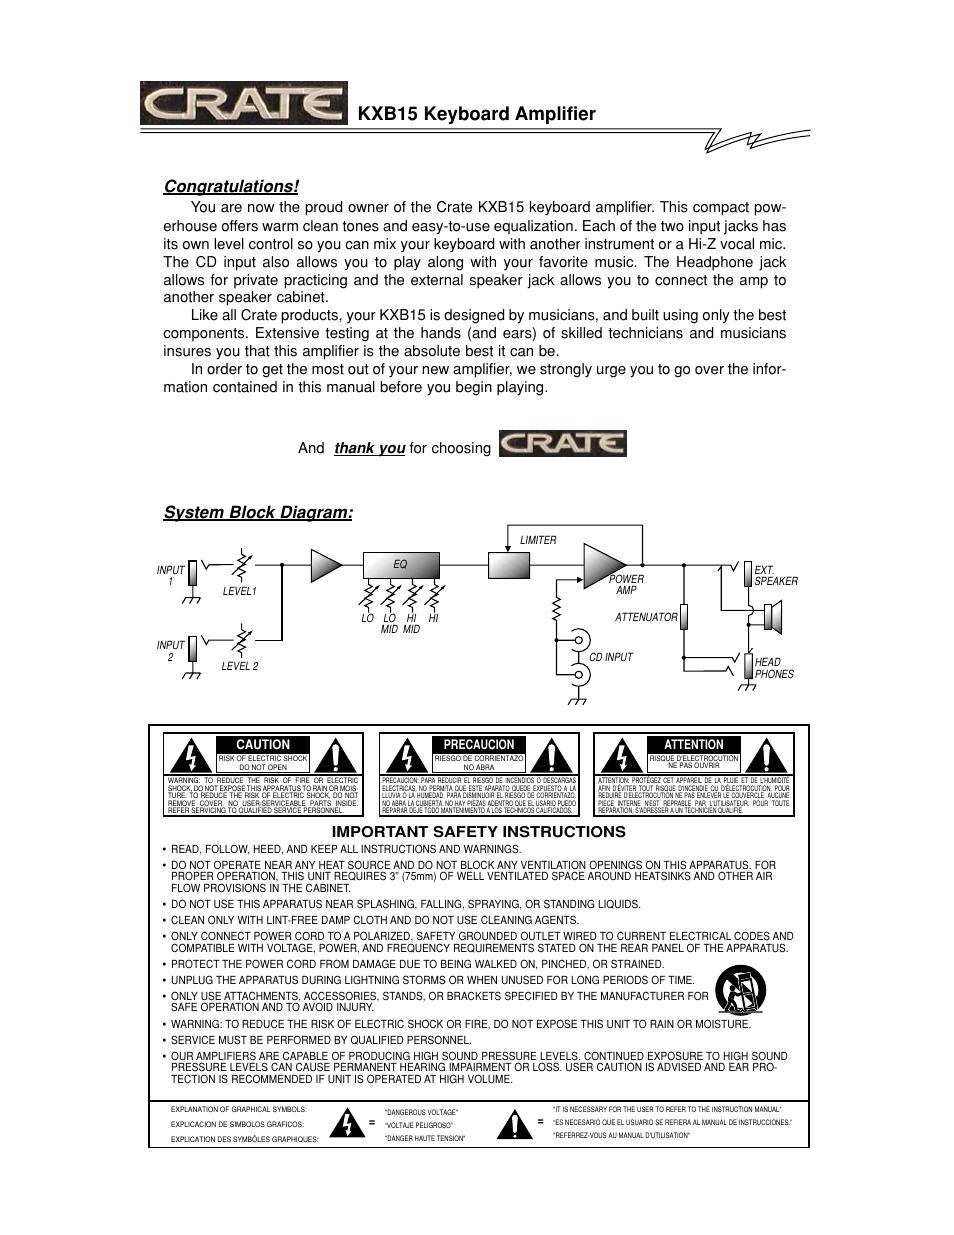 Kxb15 keyboard amplifier, System block diagram | Crate Amplifiers KXB15  User Manual | Page 2